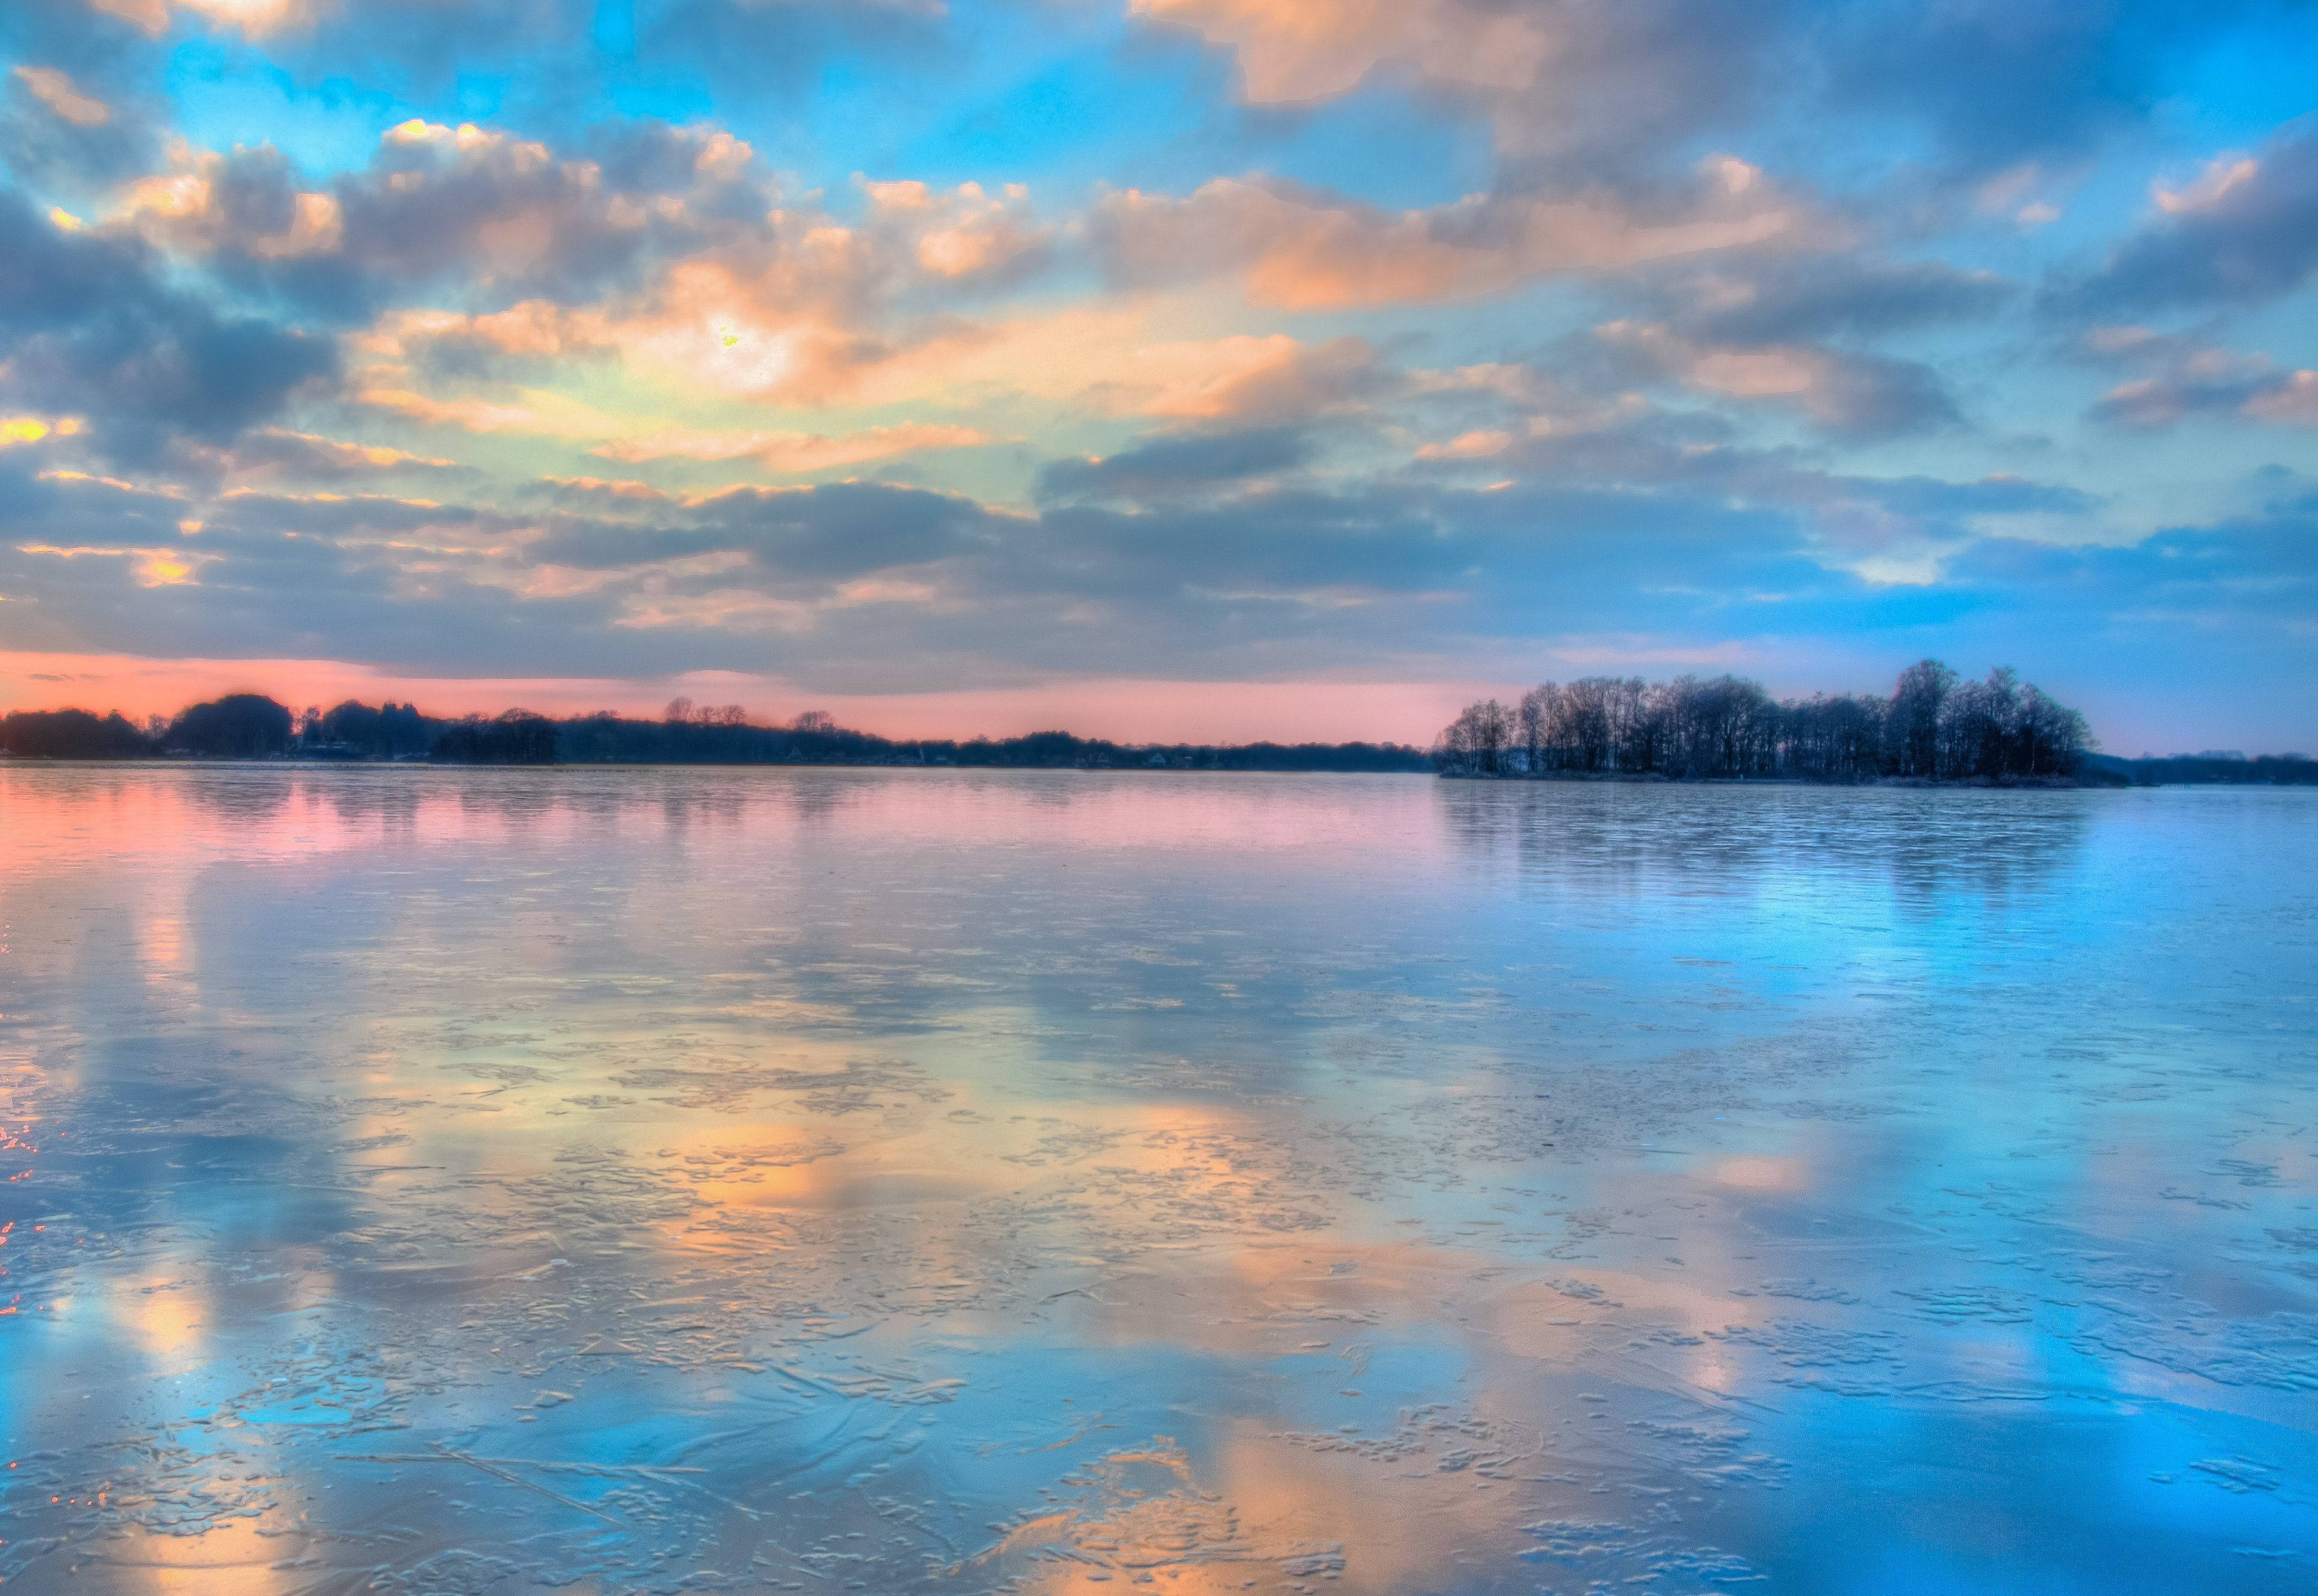 Blue orange and yellow sunset photo